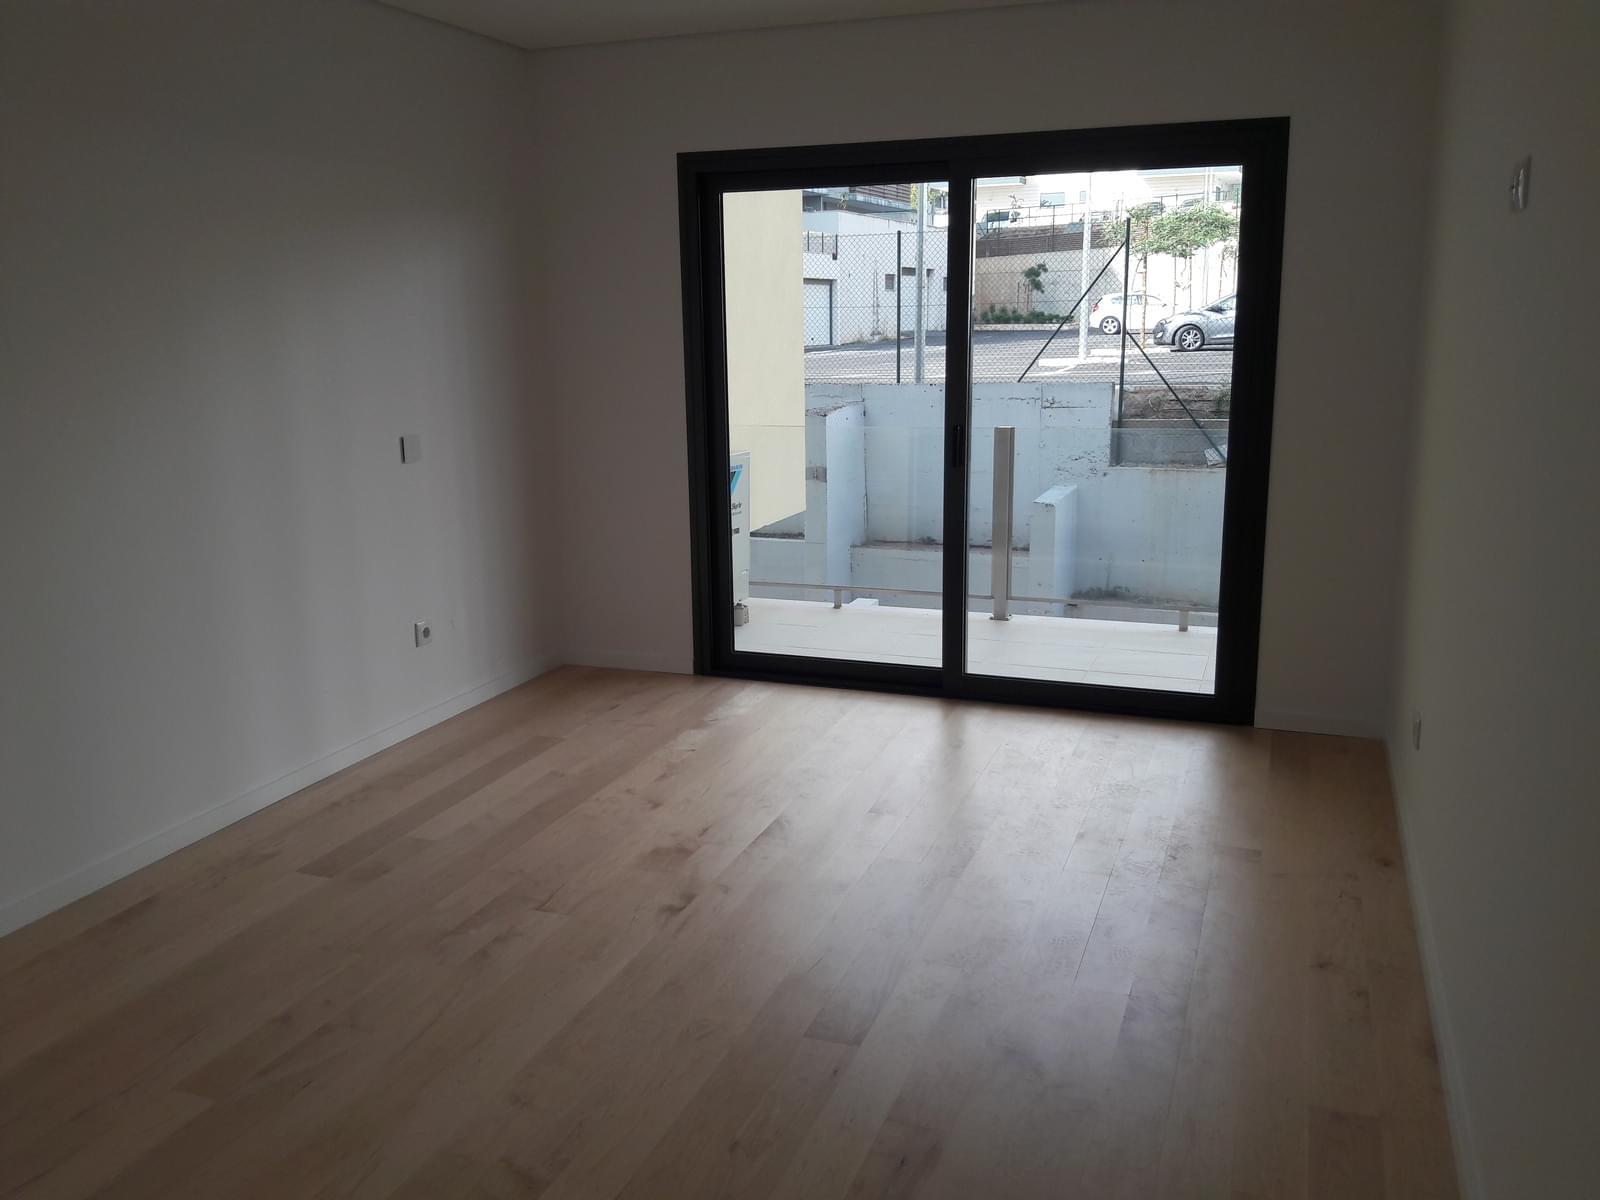 pf18284-apartamento-t2-cascais-b5906f9c-2cbf-48e2-aa93-ac5a7fc87a98